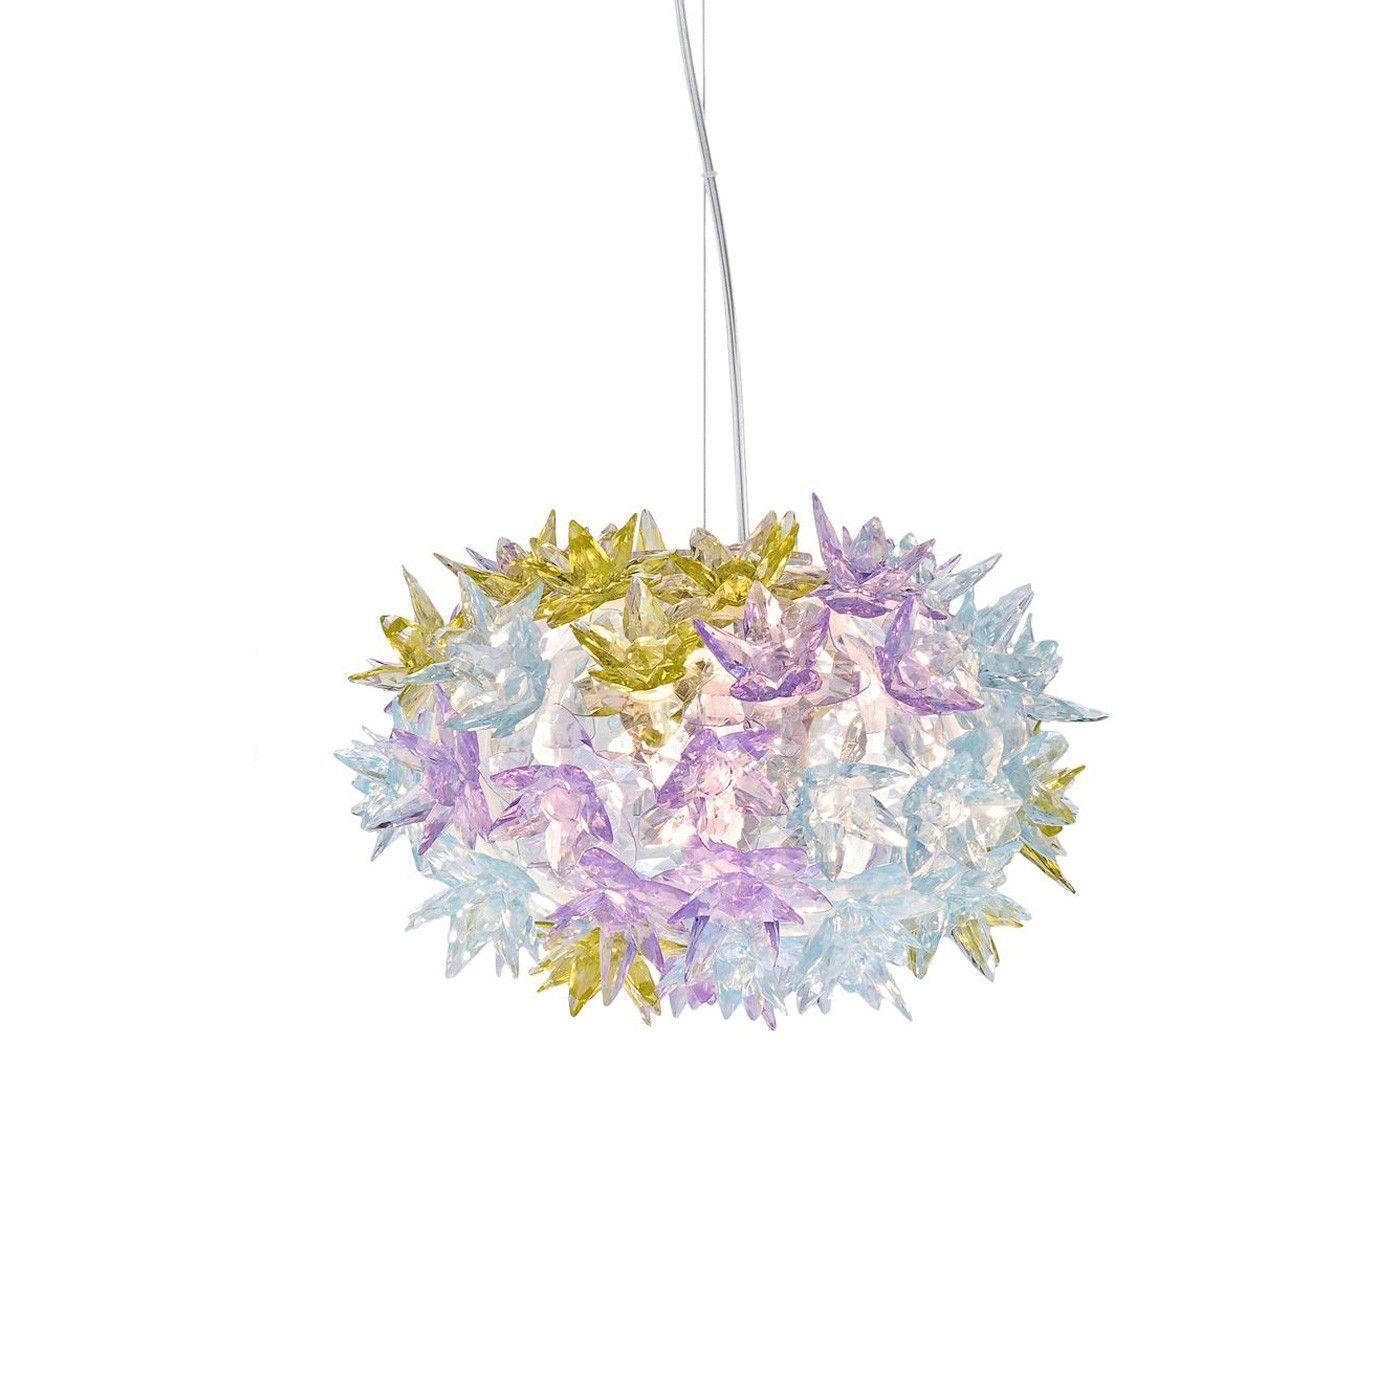 ferruccio laviani lighting. Kartell Ferruccio Laviani Bloom Pendant Crystal Lighting I